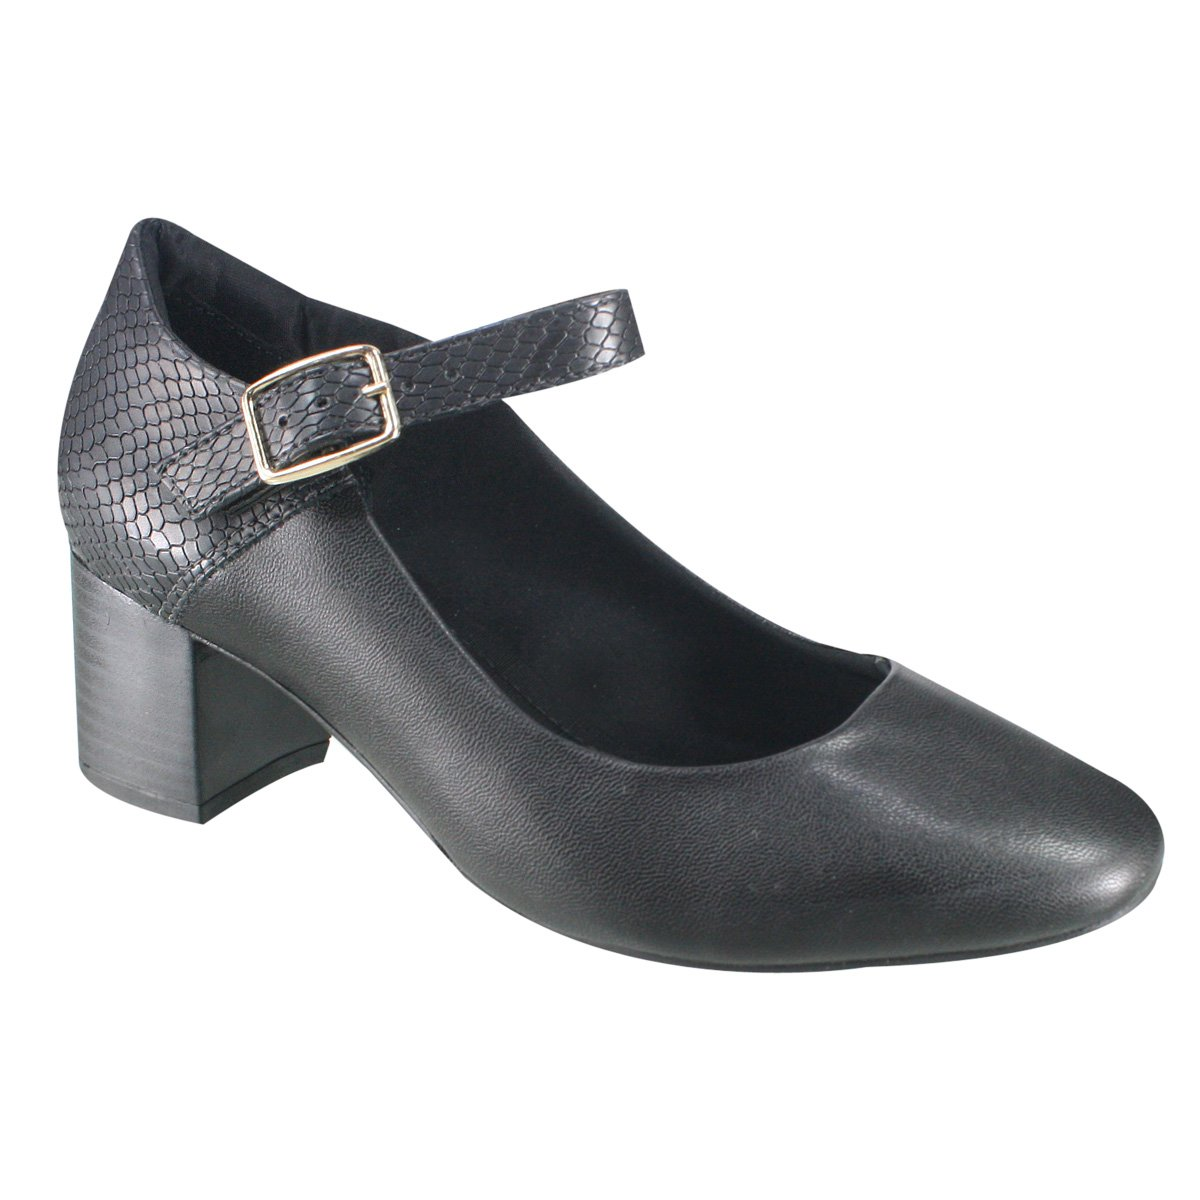 798c9db0f7 Sapato Feminino Ramarim Total Comfort 17-97203 000011 - Preto (Napa ...